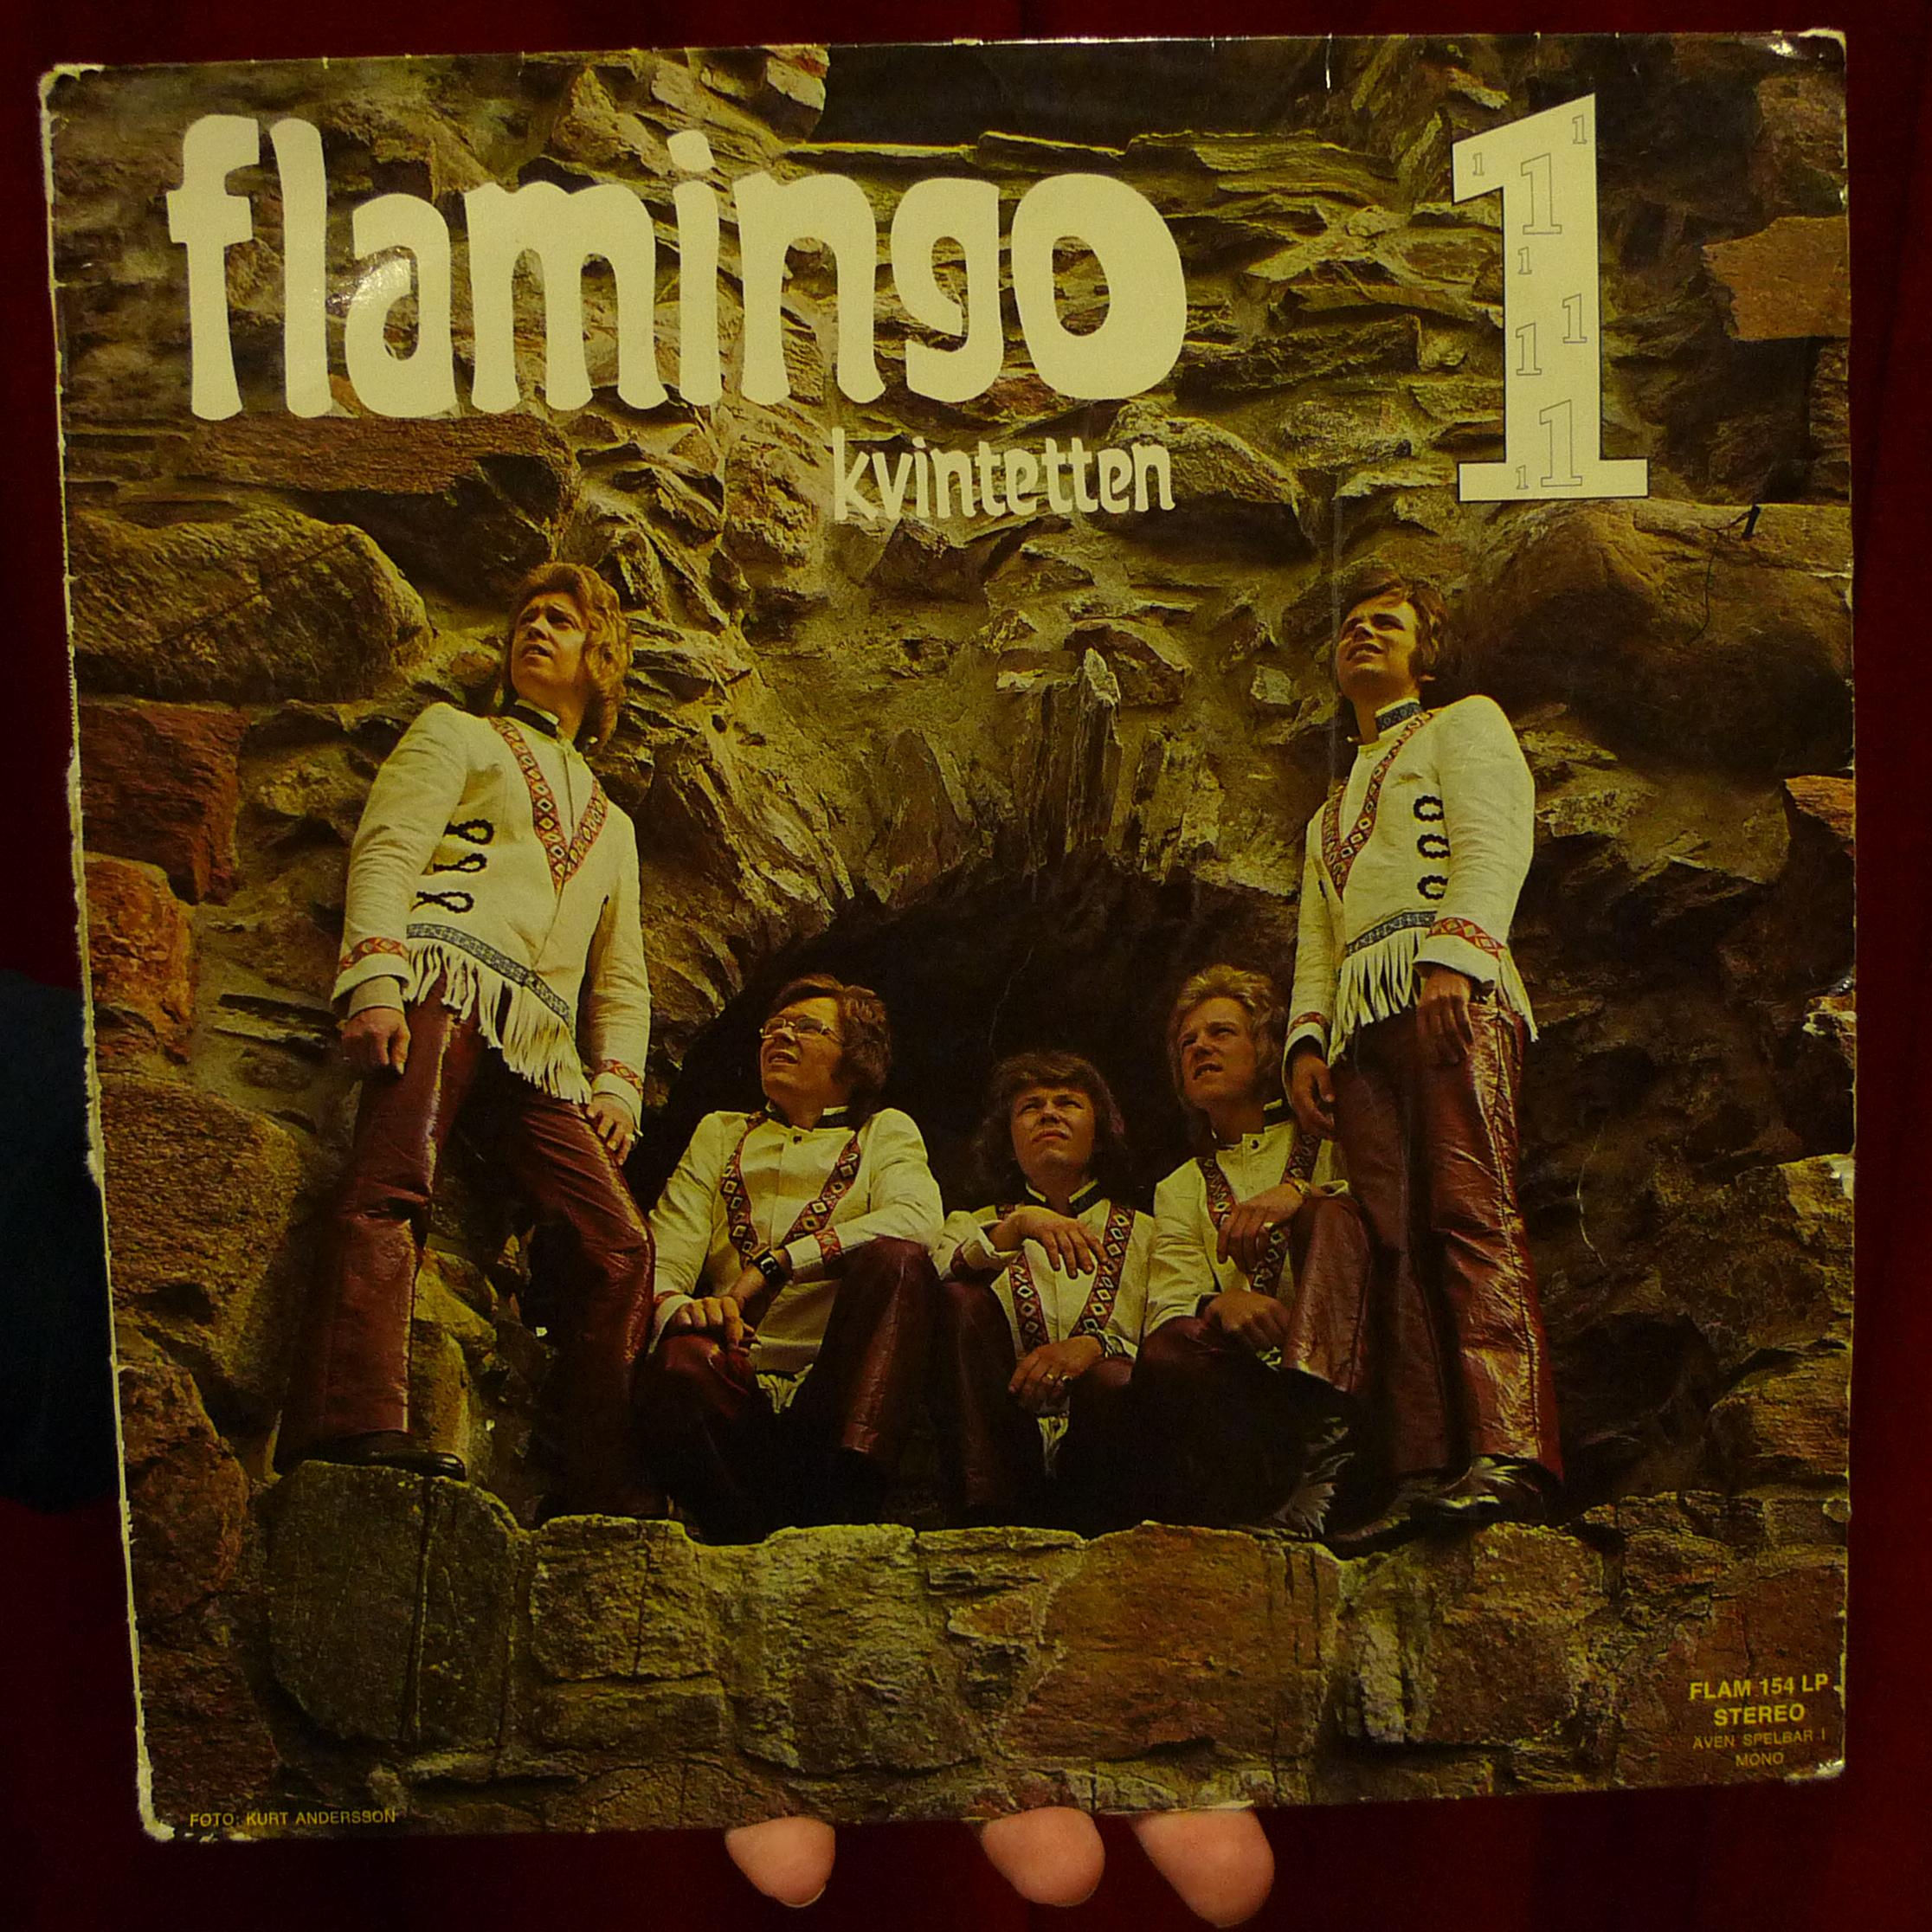 dj50s ep039 sleeve flamingokvintetten